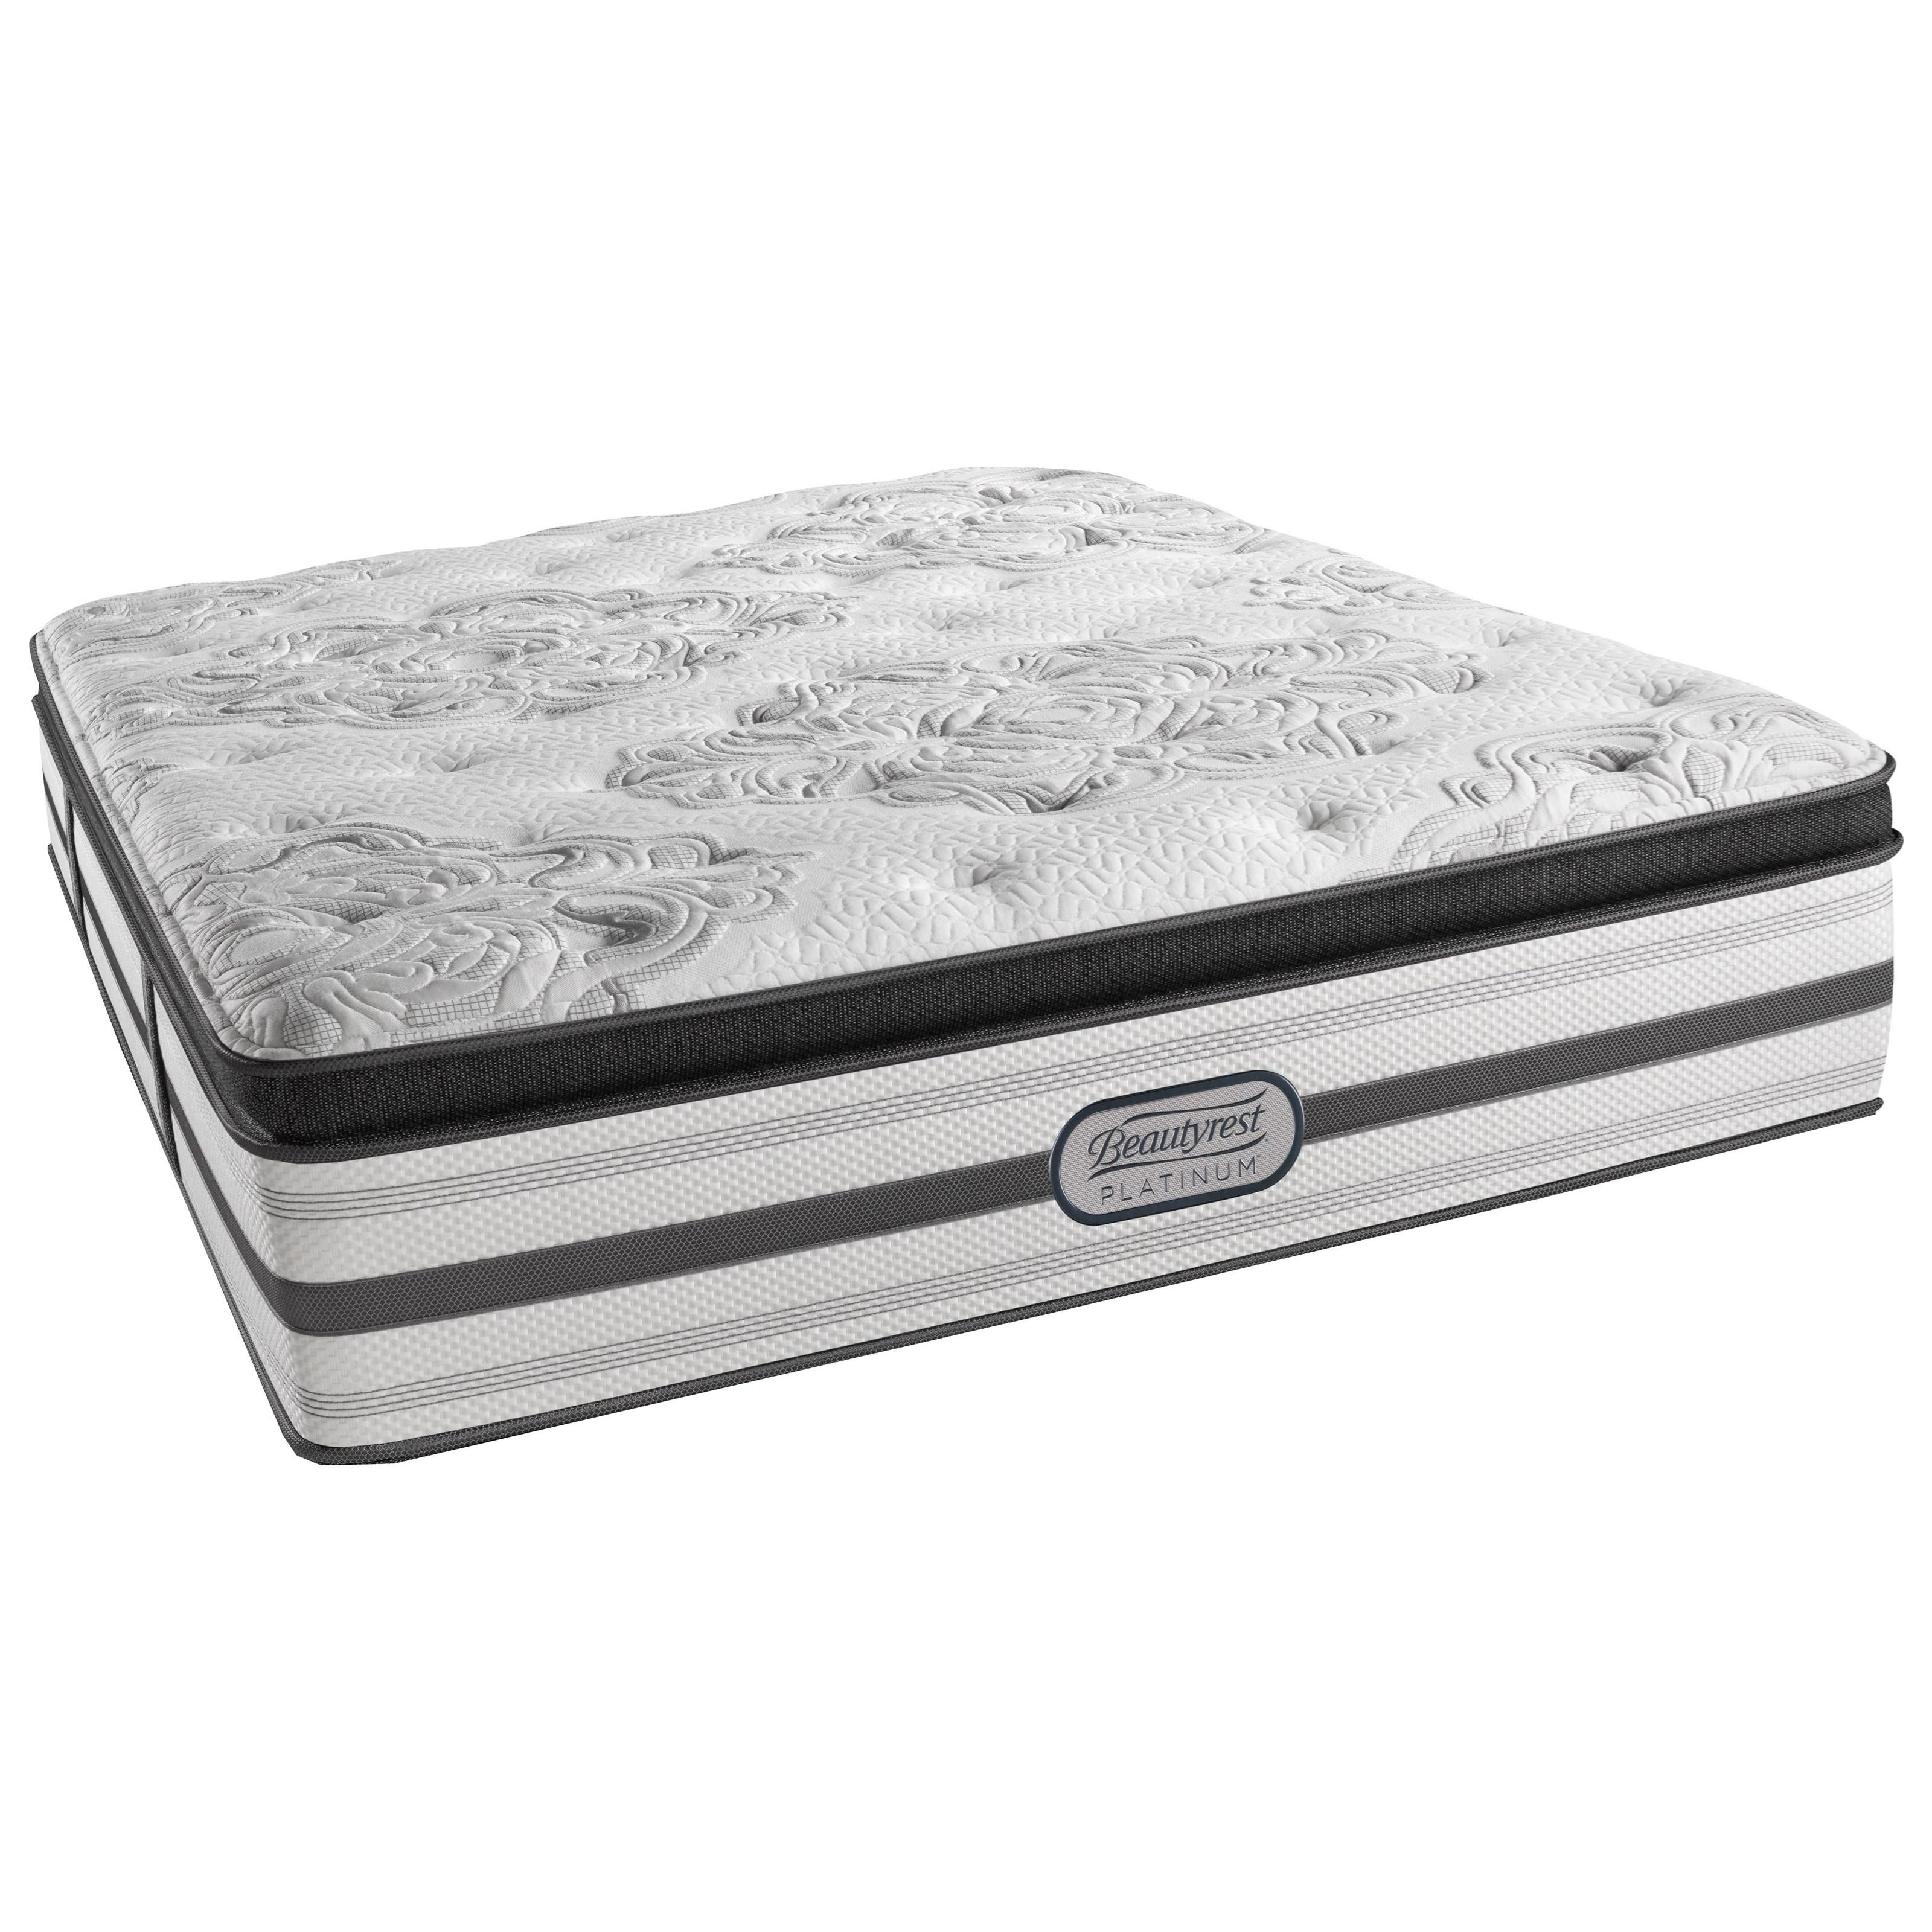 Beautyrest Platinum Gabriella King Plush Pillow Top Adjustable Set - Item Number: LV3PLPT-K+2xSM2-TXLK